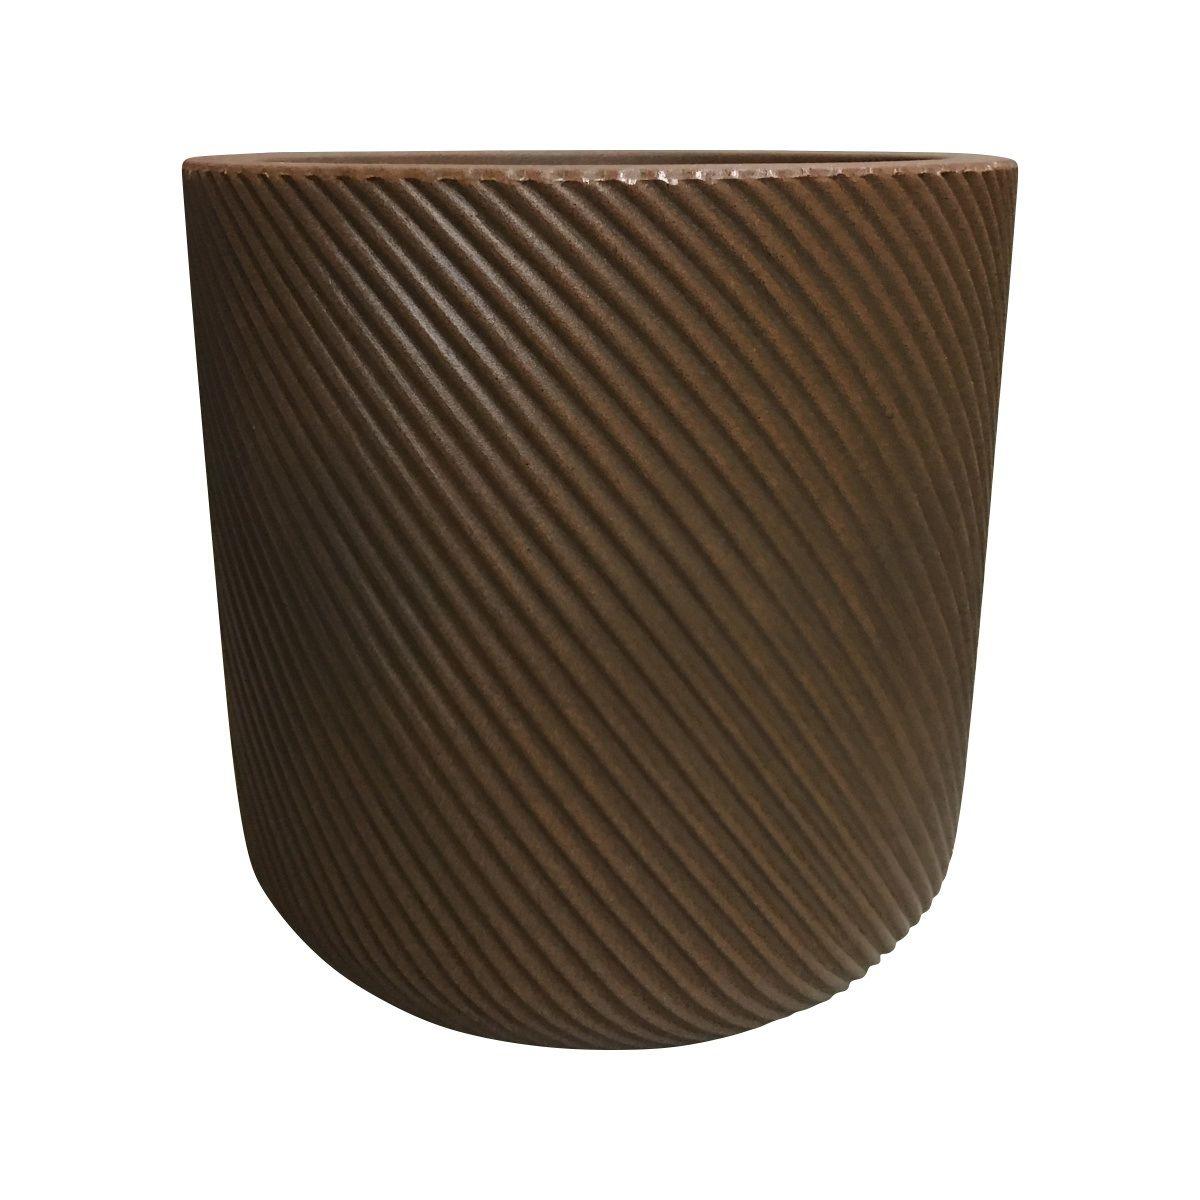 Vaso Vite Cilíndrico Vogue cor Ferrugem 34cm x 33,5cm - VCP2-FE